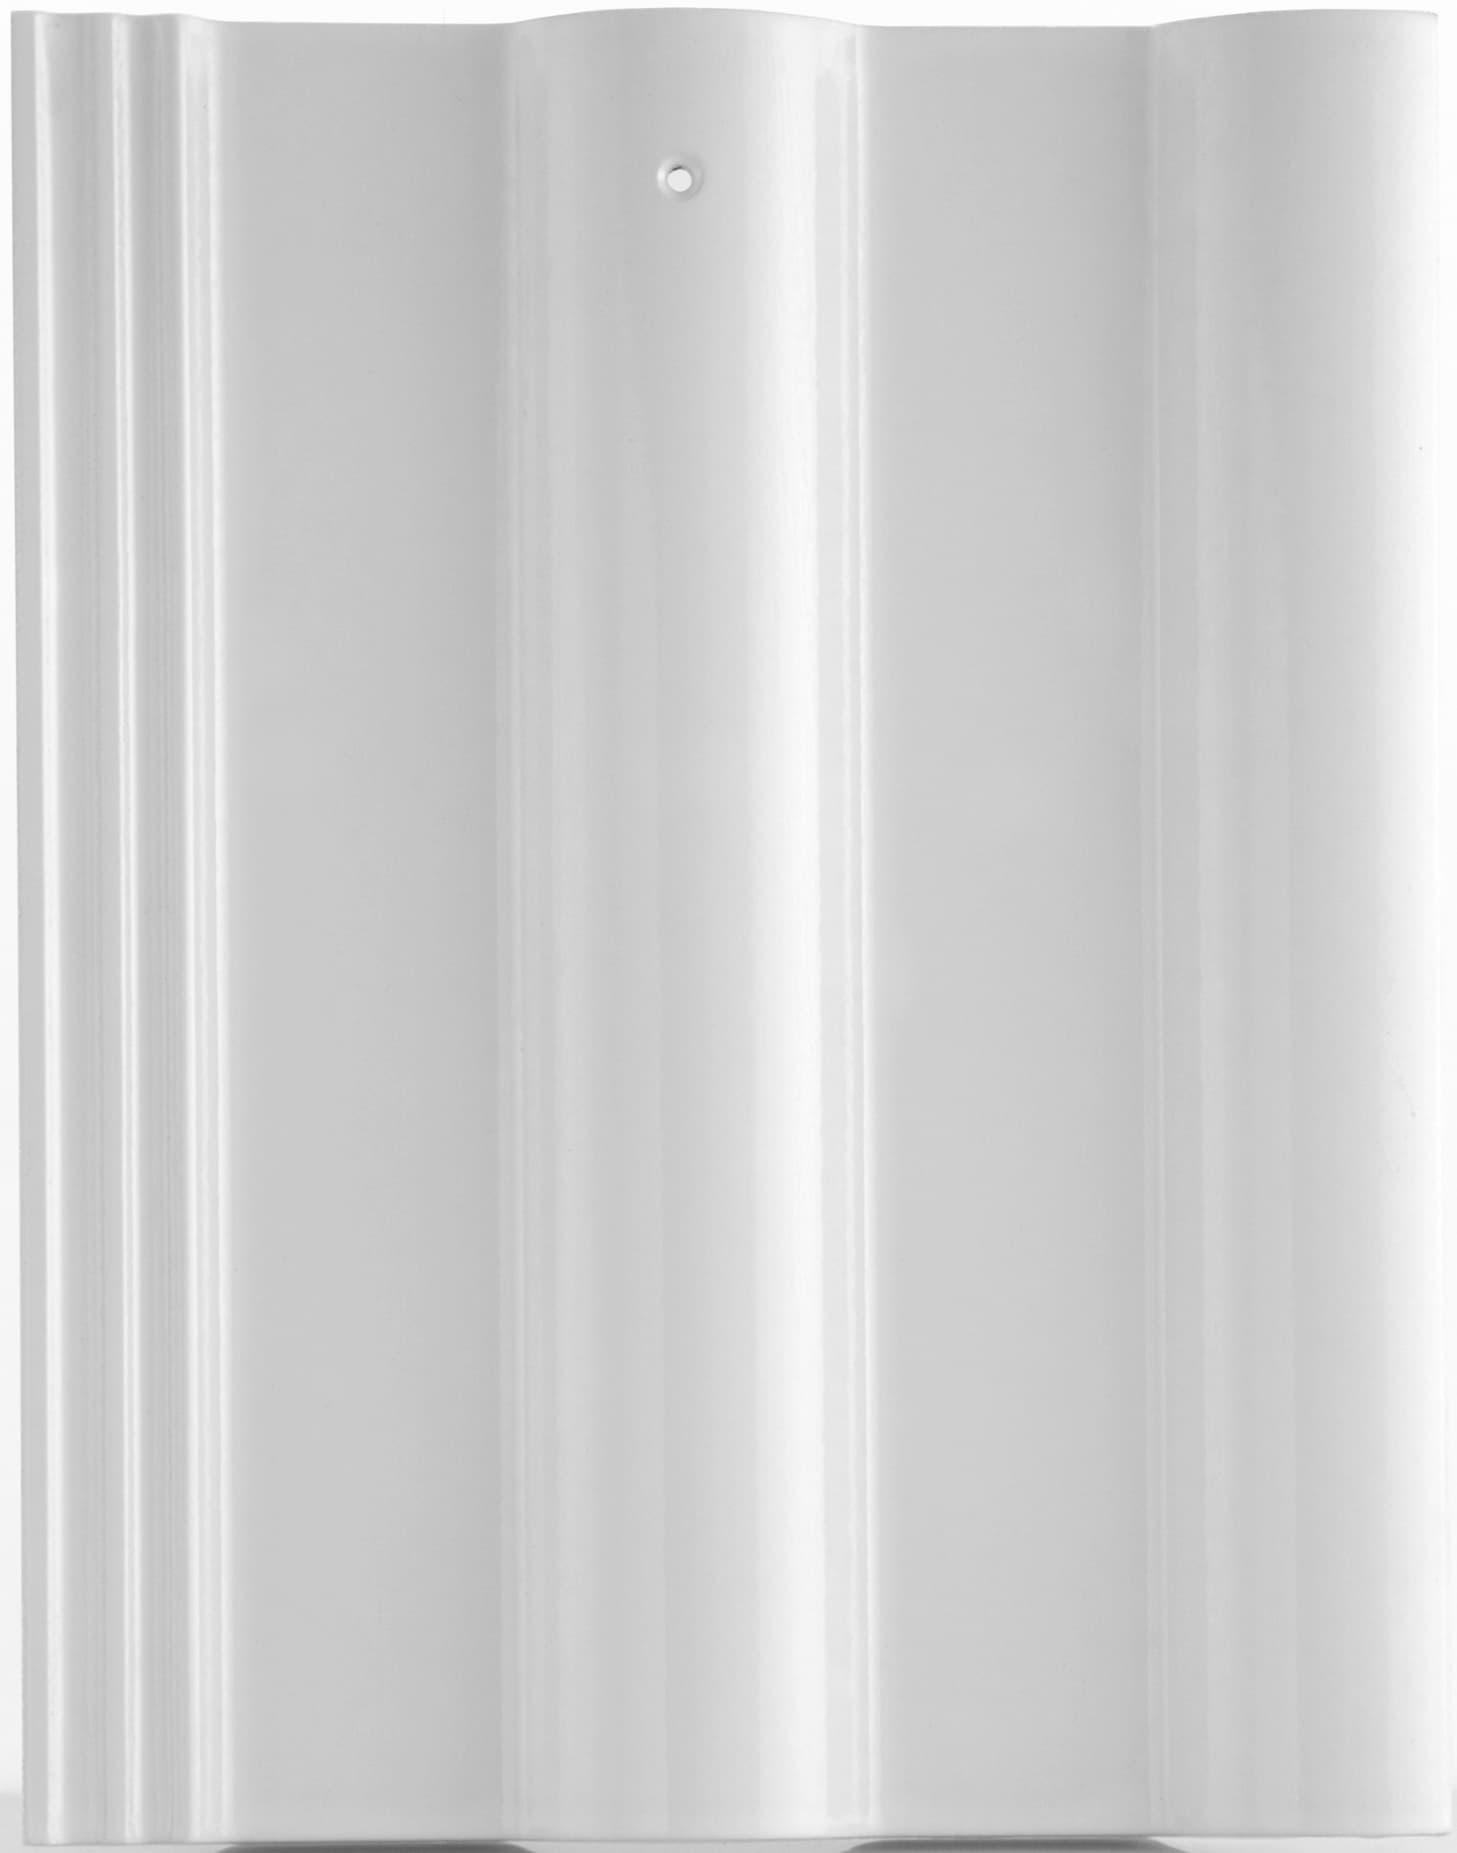 SCG Ceramic Roof Tile Manufacturer - EXCELLA Classic White Pearl